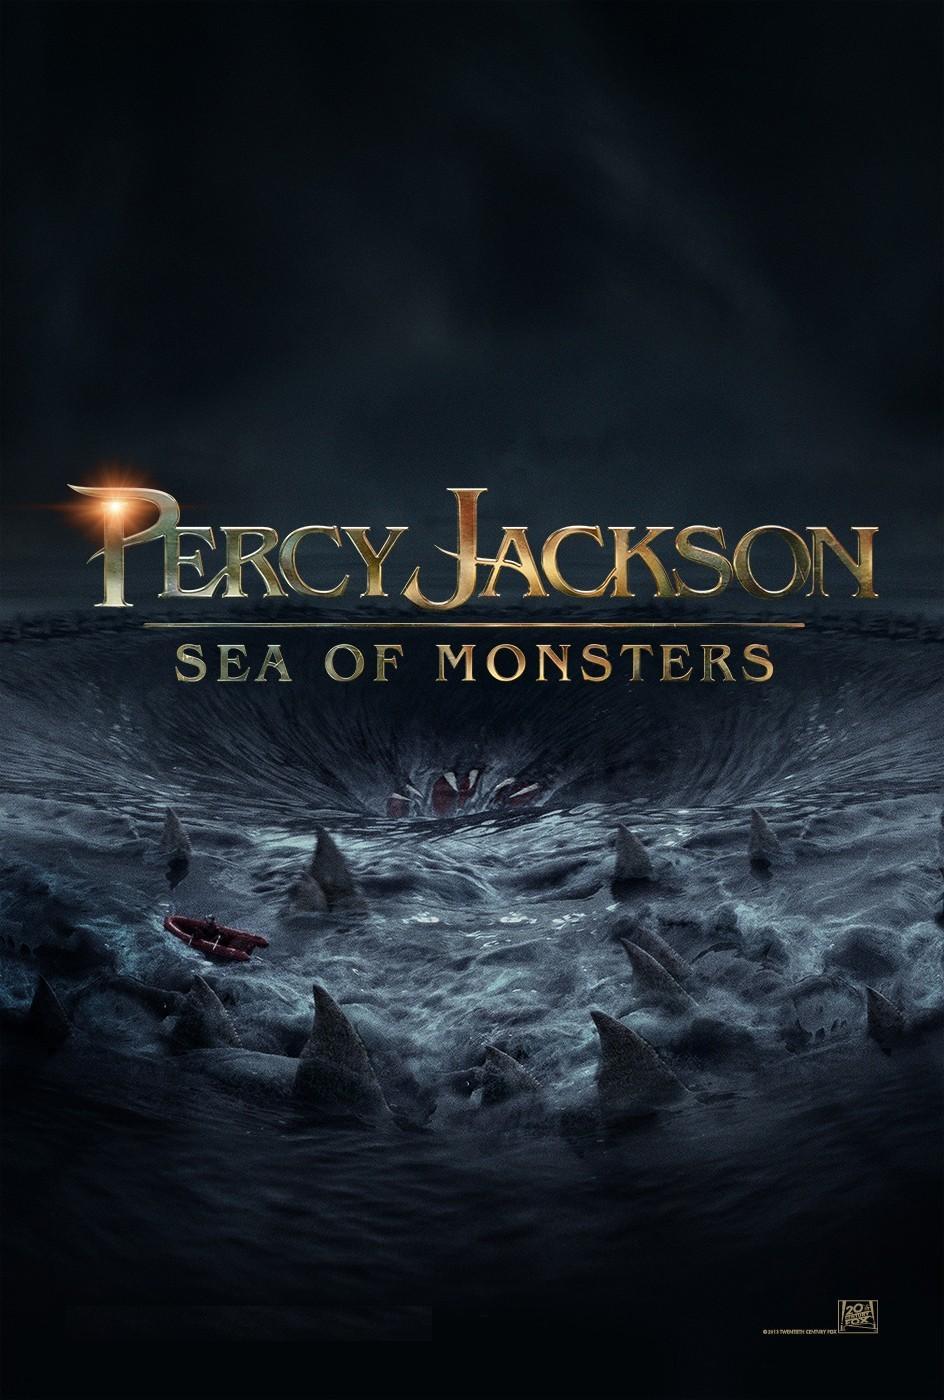 PERCY-JACKSON-SEA-OF-MONSTERS-Poster (1).jpg